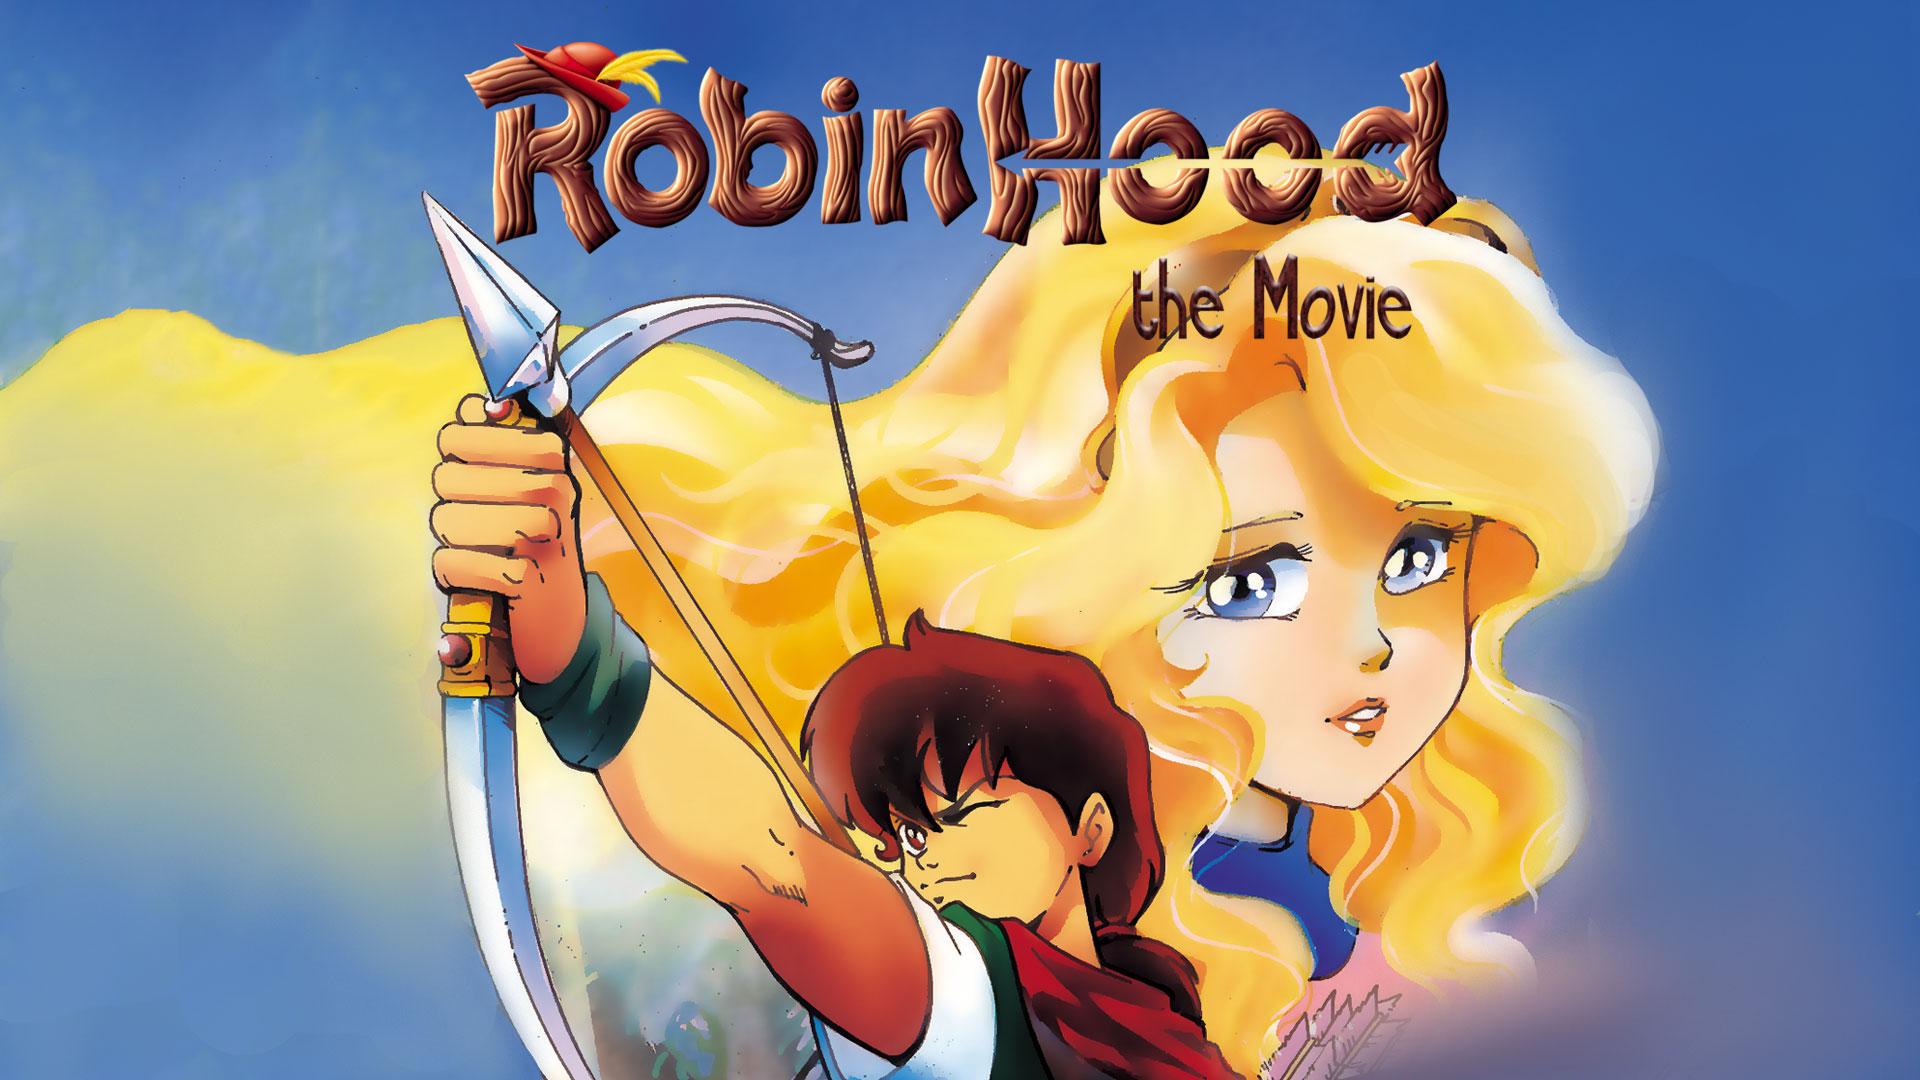 Robin Hood The Movie